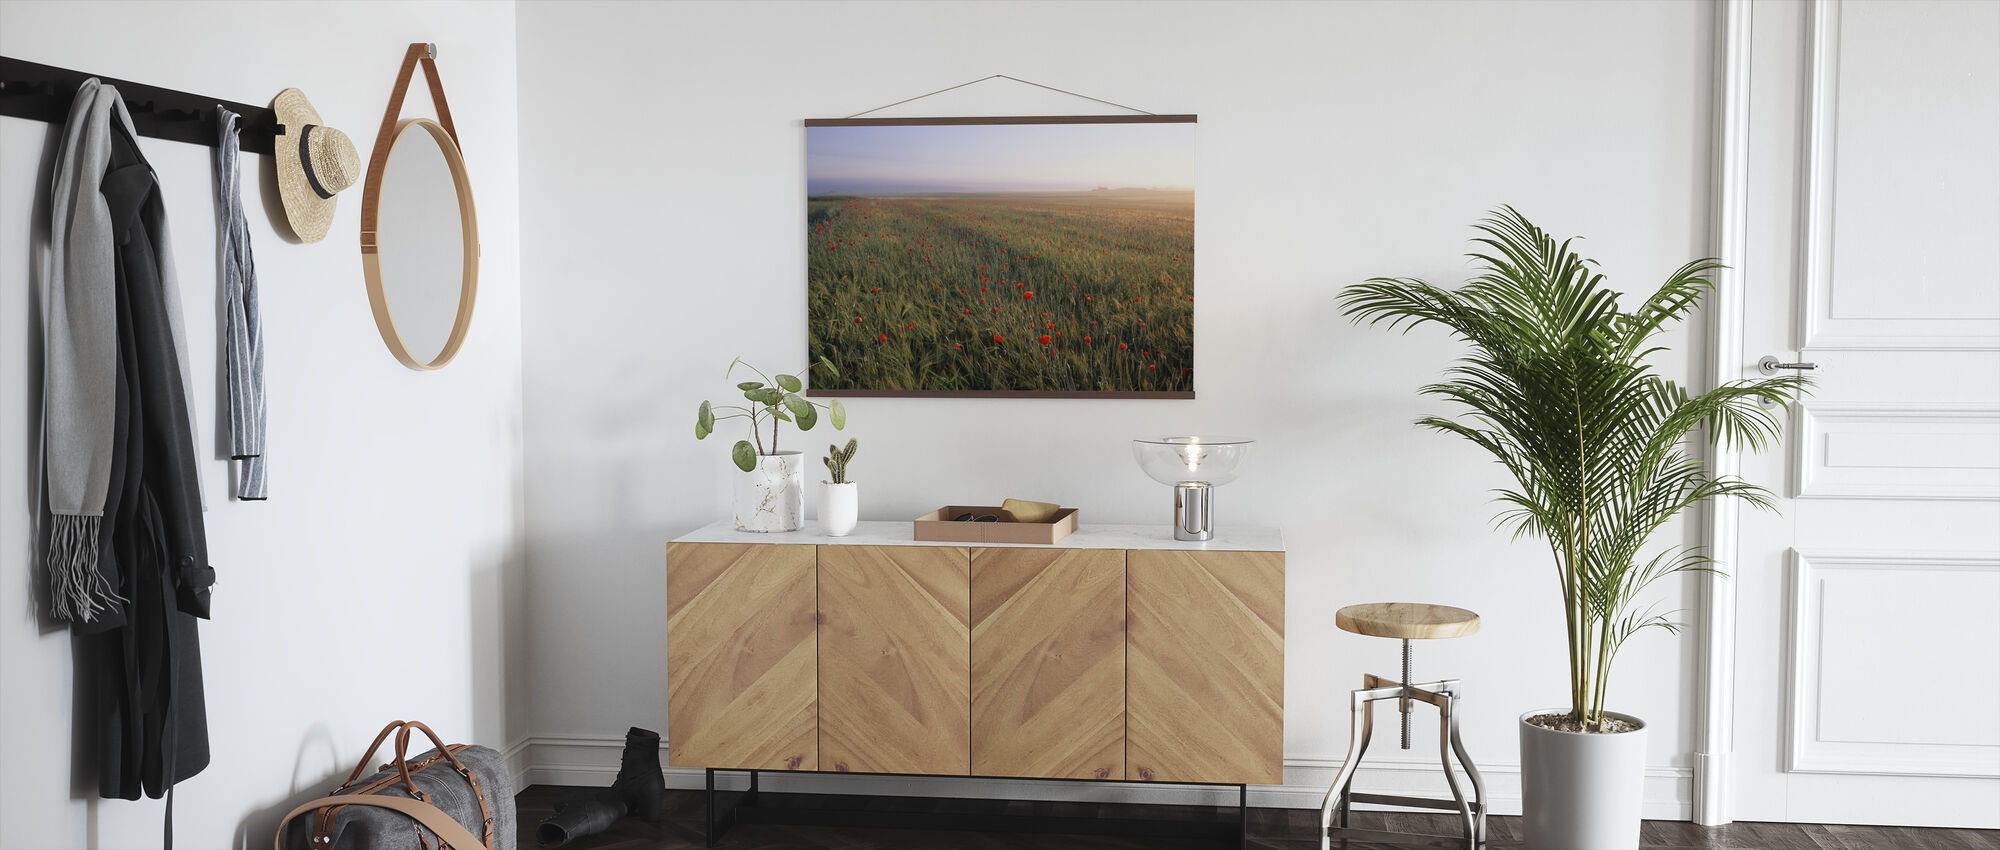 Dreamy Fields of Poppies - Poster - Hallway